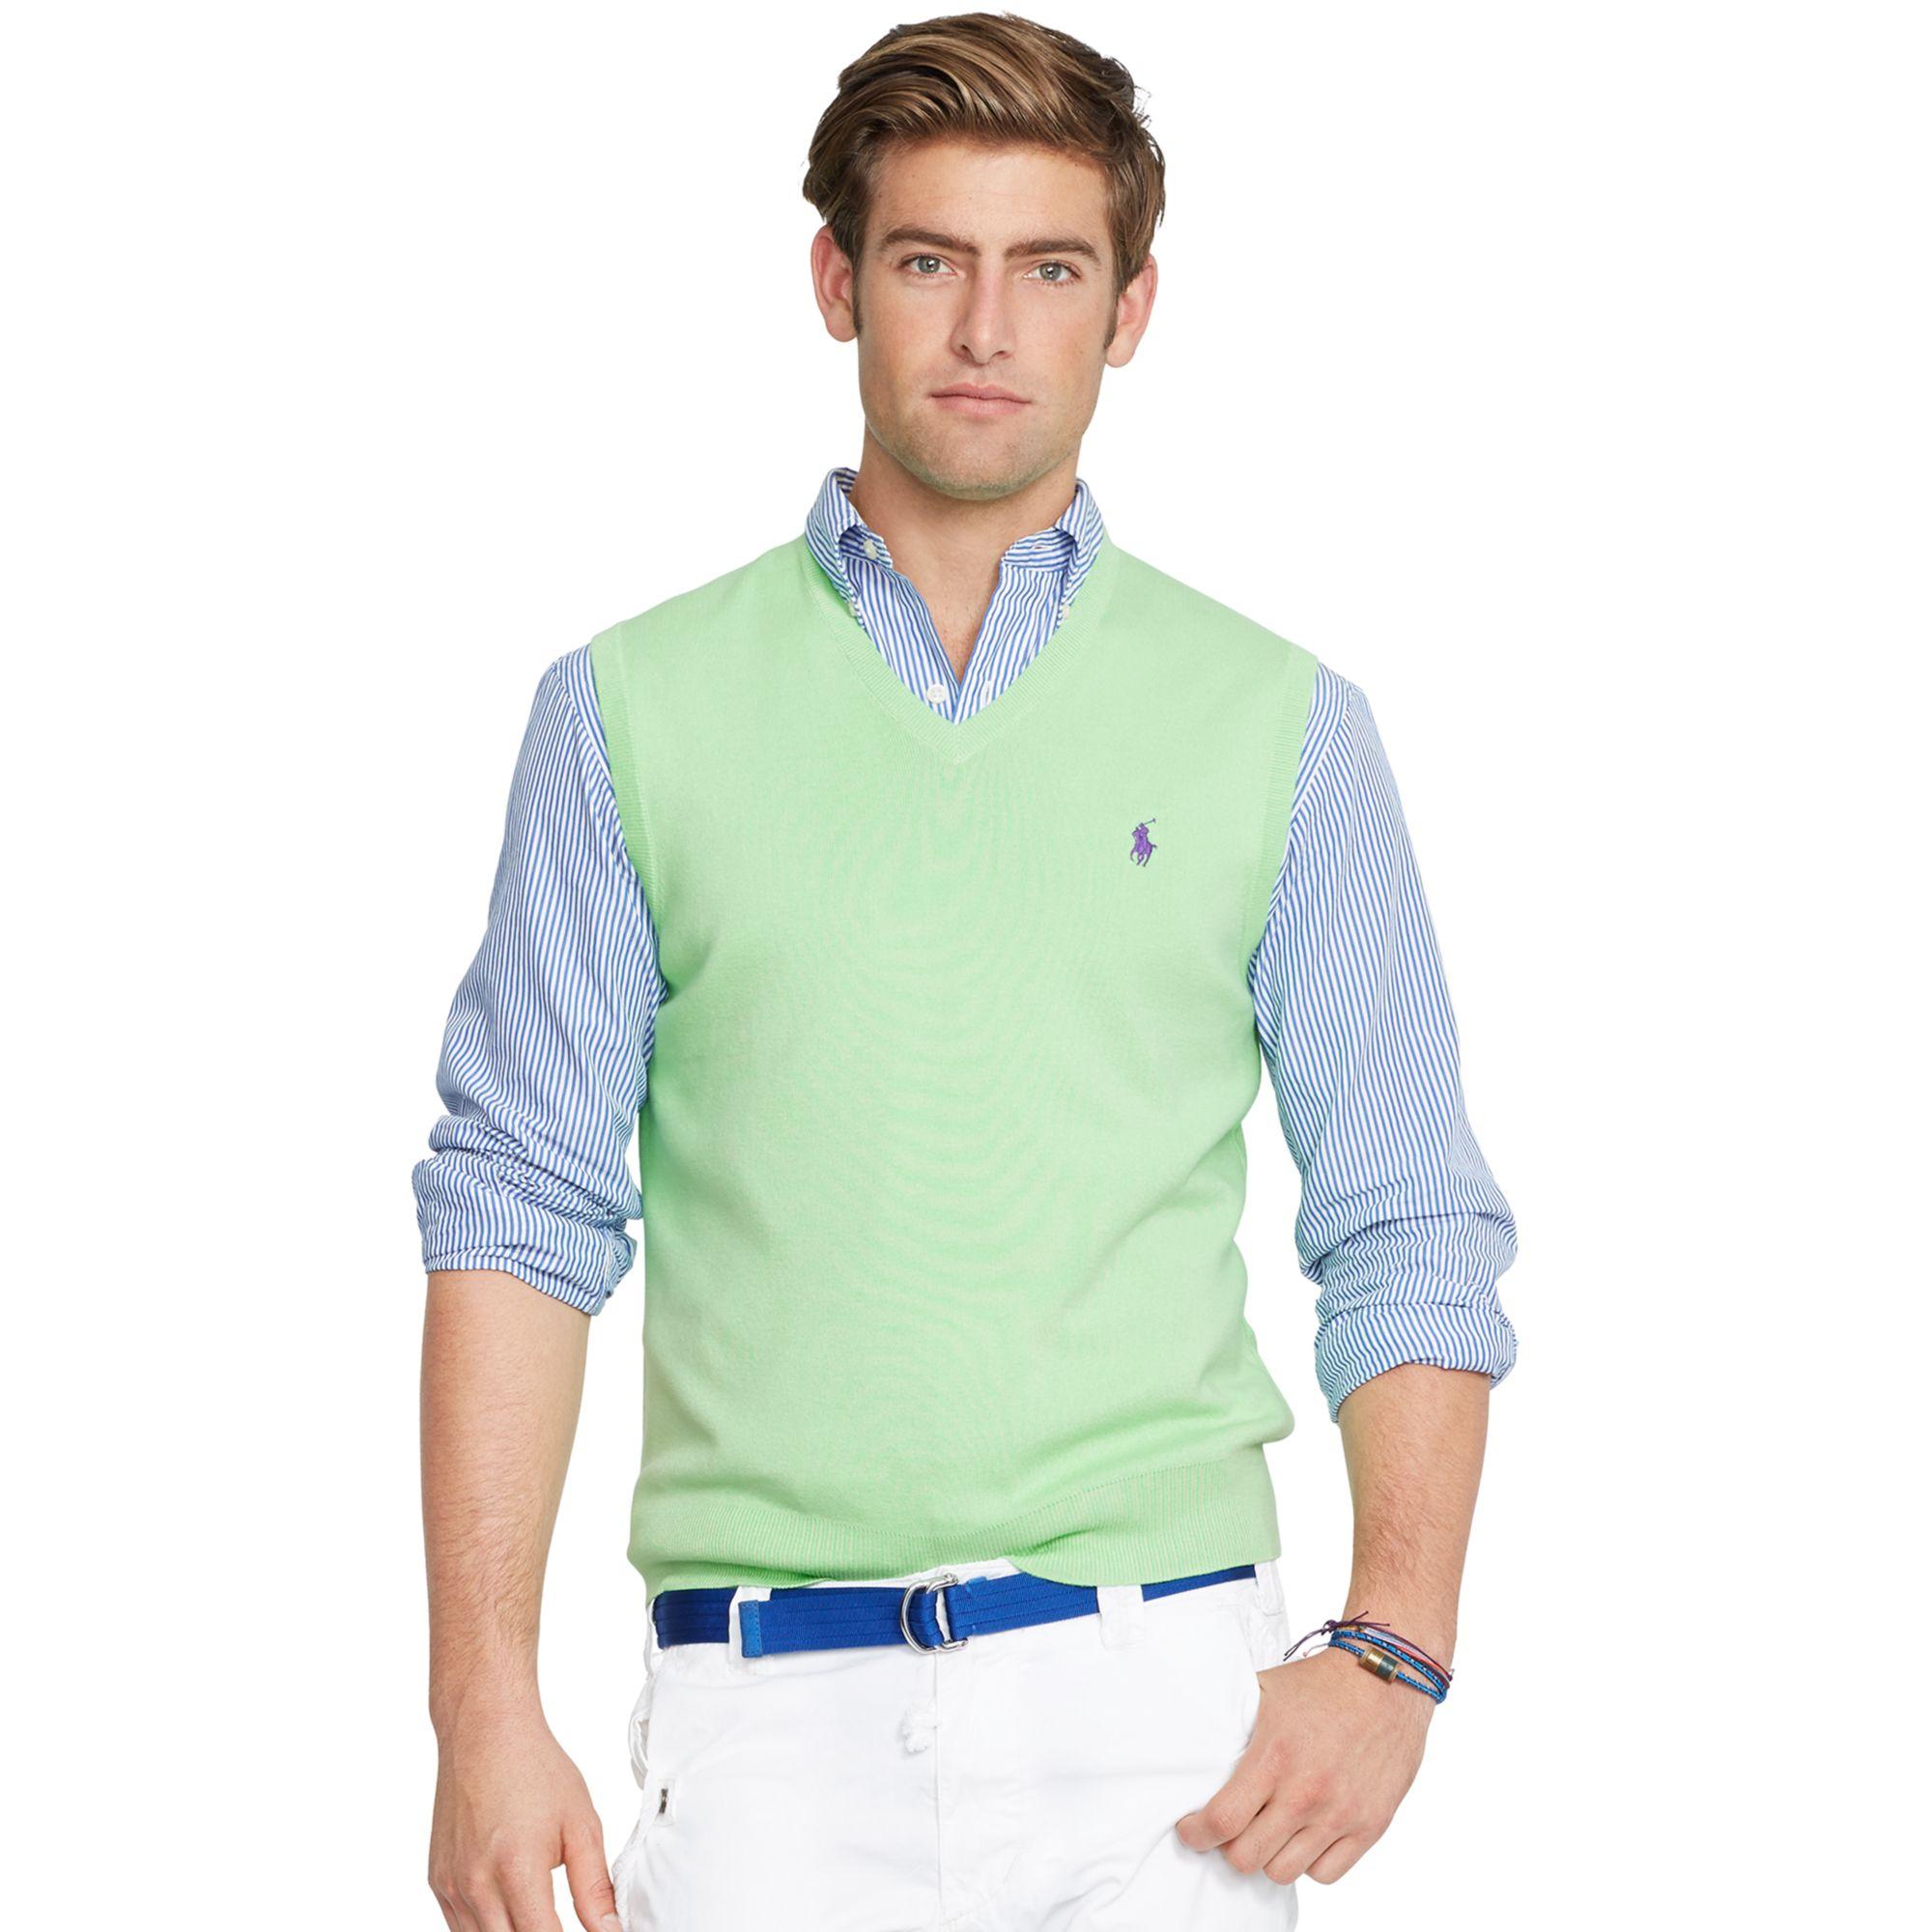 polo ralph lauren pima v neck vest in green for men optic lime lyst. Black Bedroom Furniture Sets. Home Design Ideas